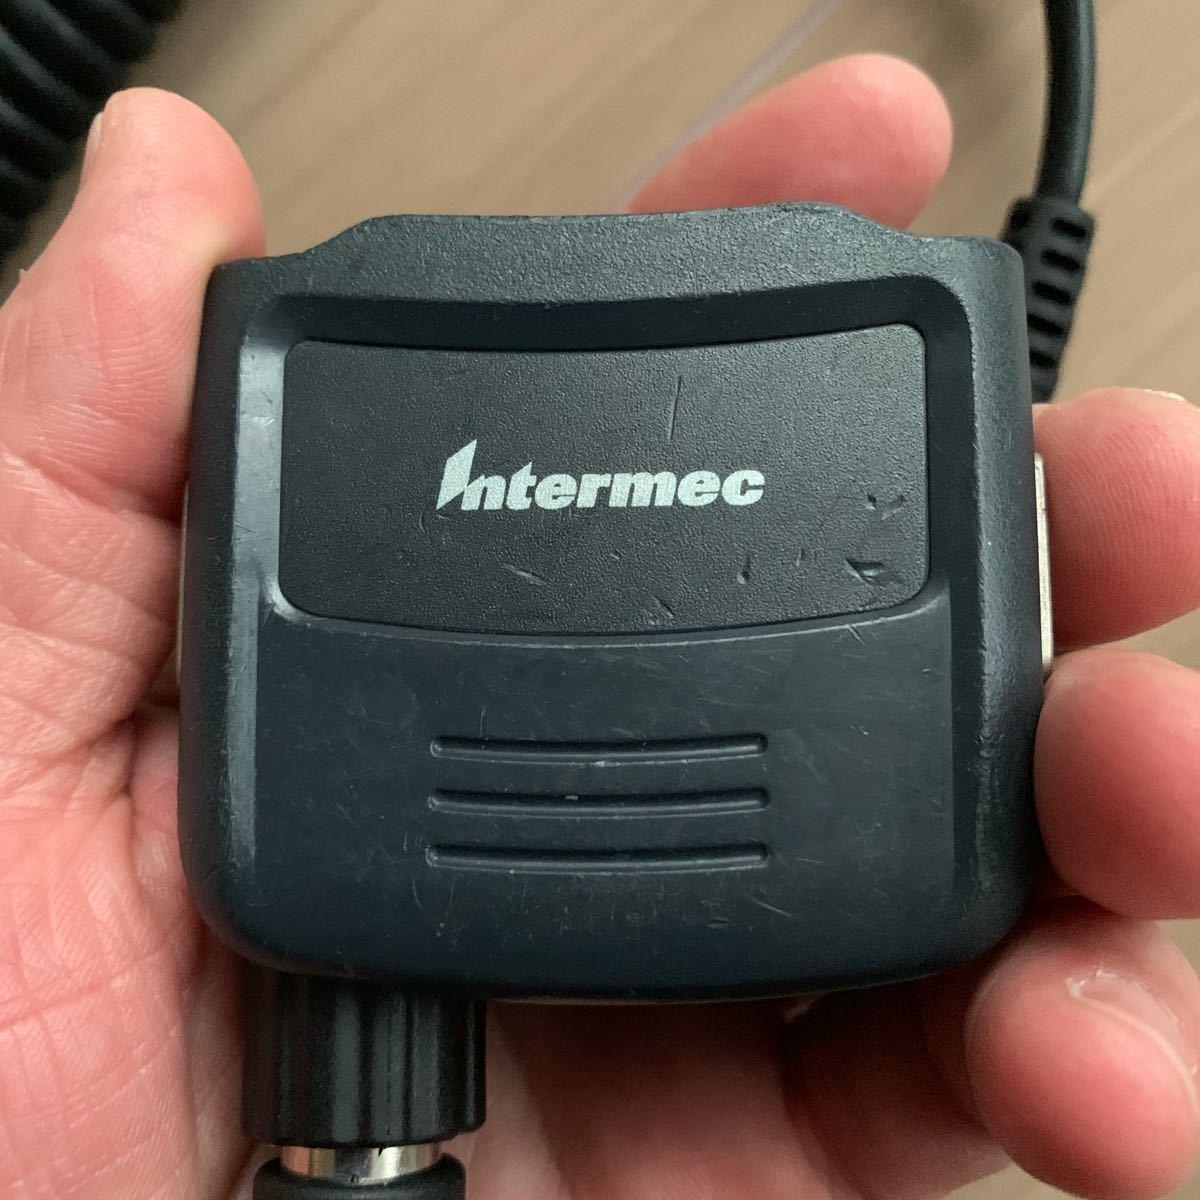 Intermec インターメック モバイルハンドヘルドコンピュータ CN70 CN70e CK71 Vehicle Power Adapter 9002AX01 852-071-001 850-567-001_画像2